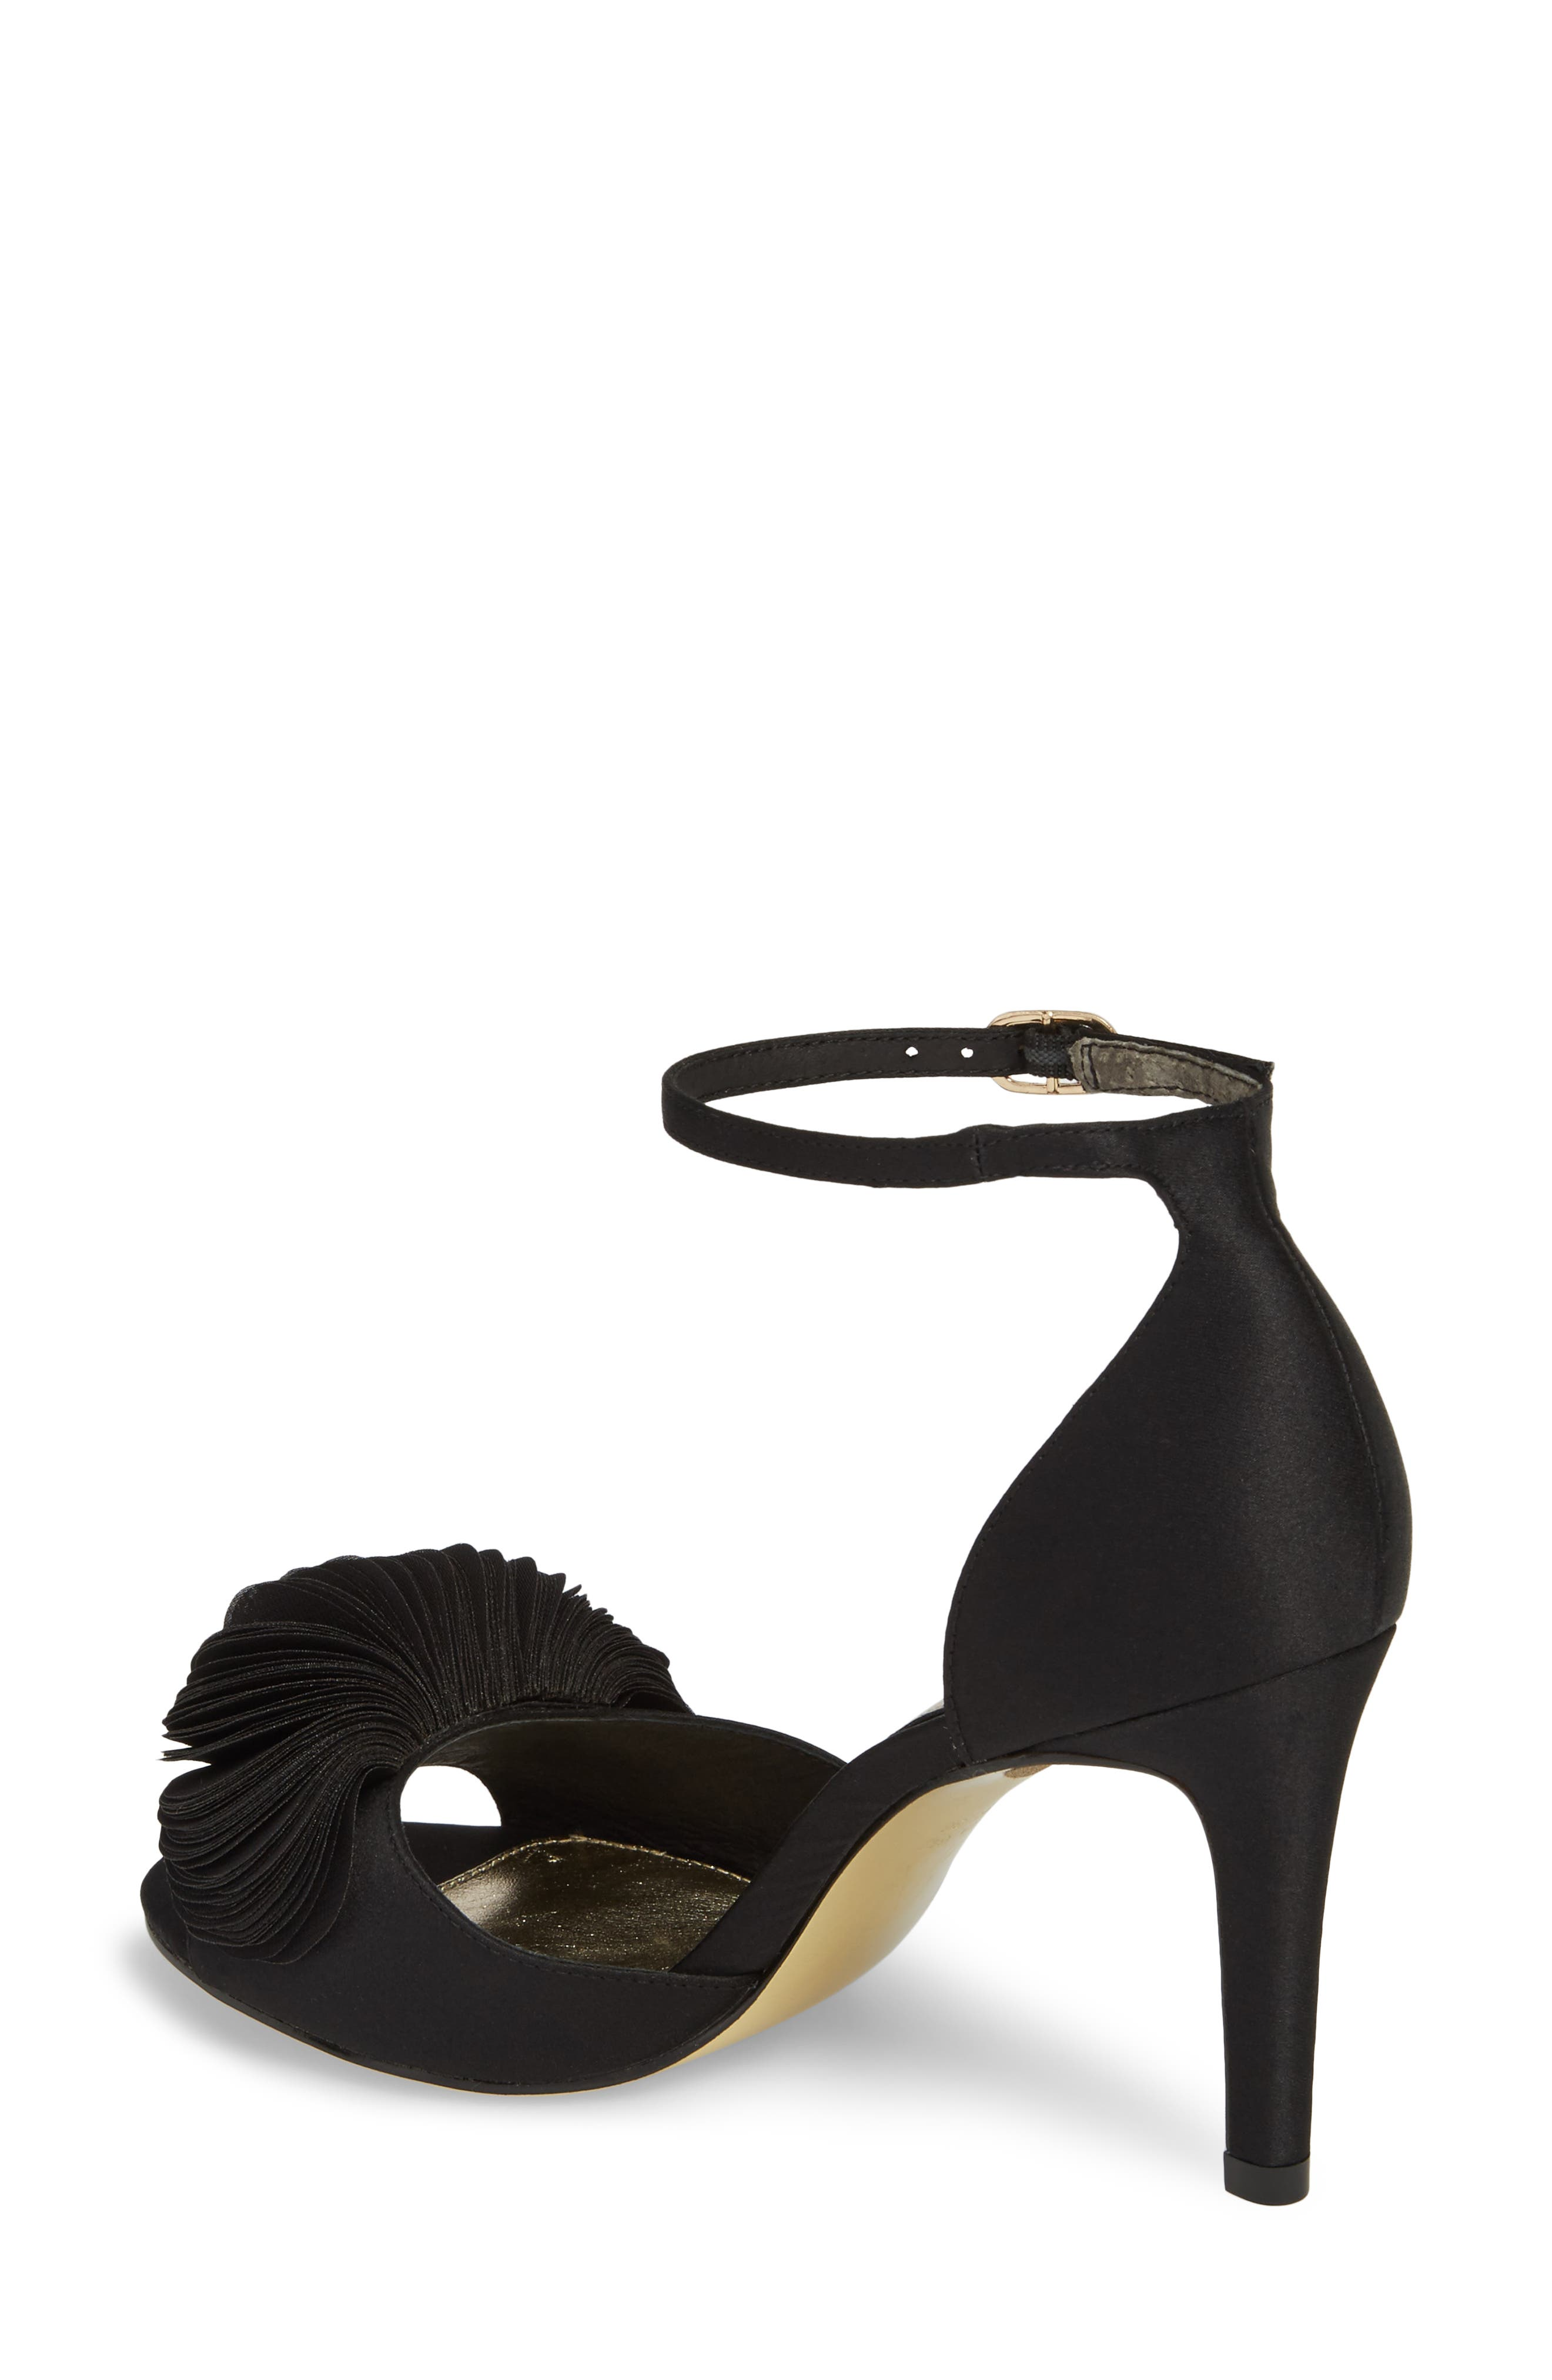 Gracie Ankle Strap Sandal,                             Alternate thumbnail 2, color,                             BLACK FABRIC